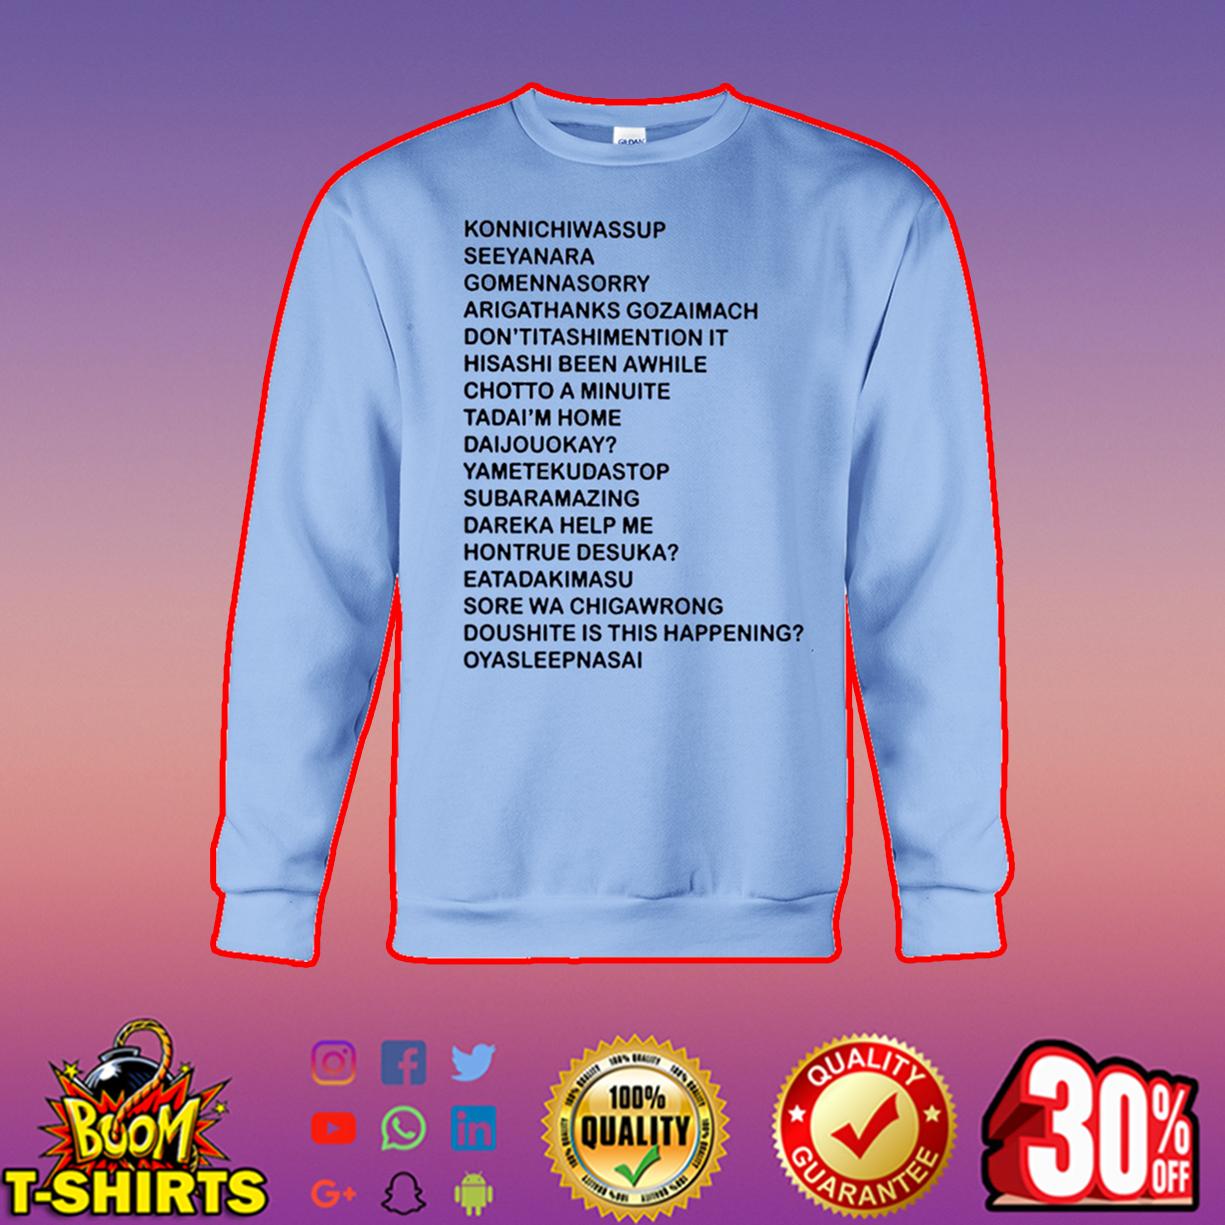 Konnichiwassup seeyanara gomennasorry sweatshirt